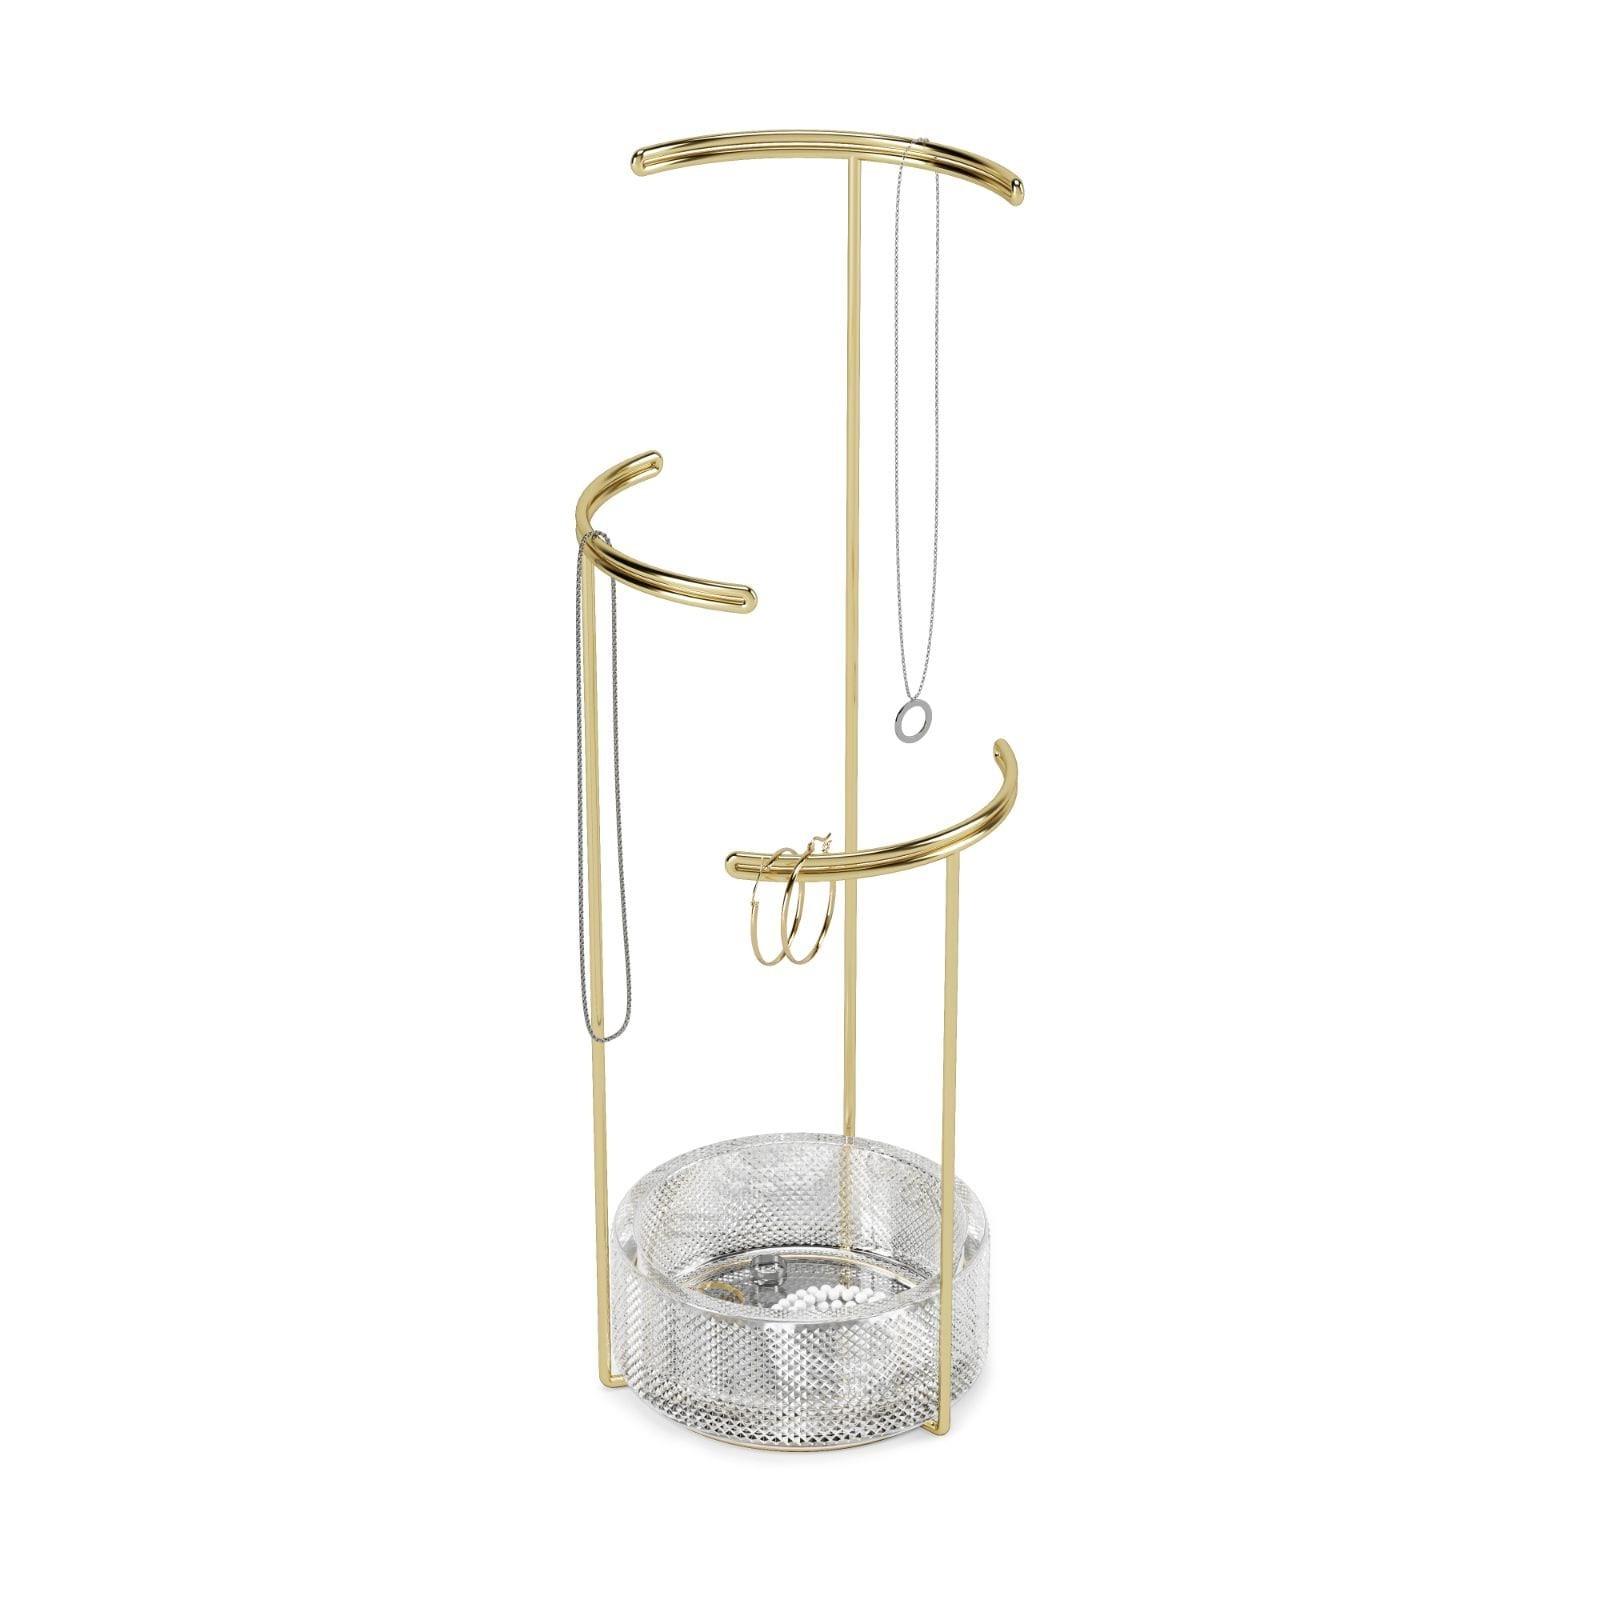 Tesora Jewelry Stand (Glass / Brass) - Umbra